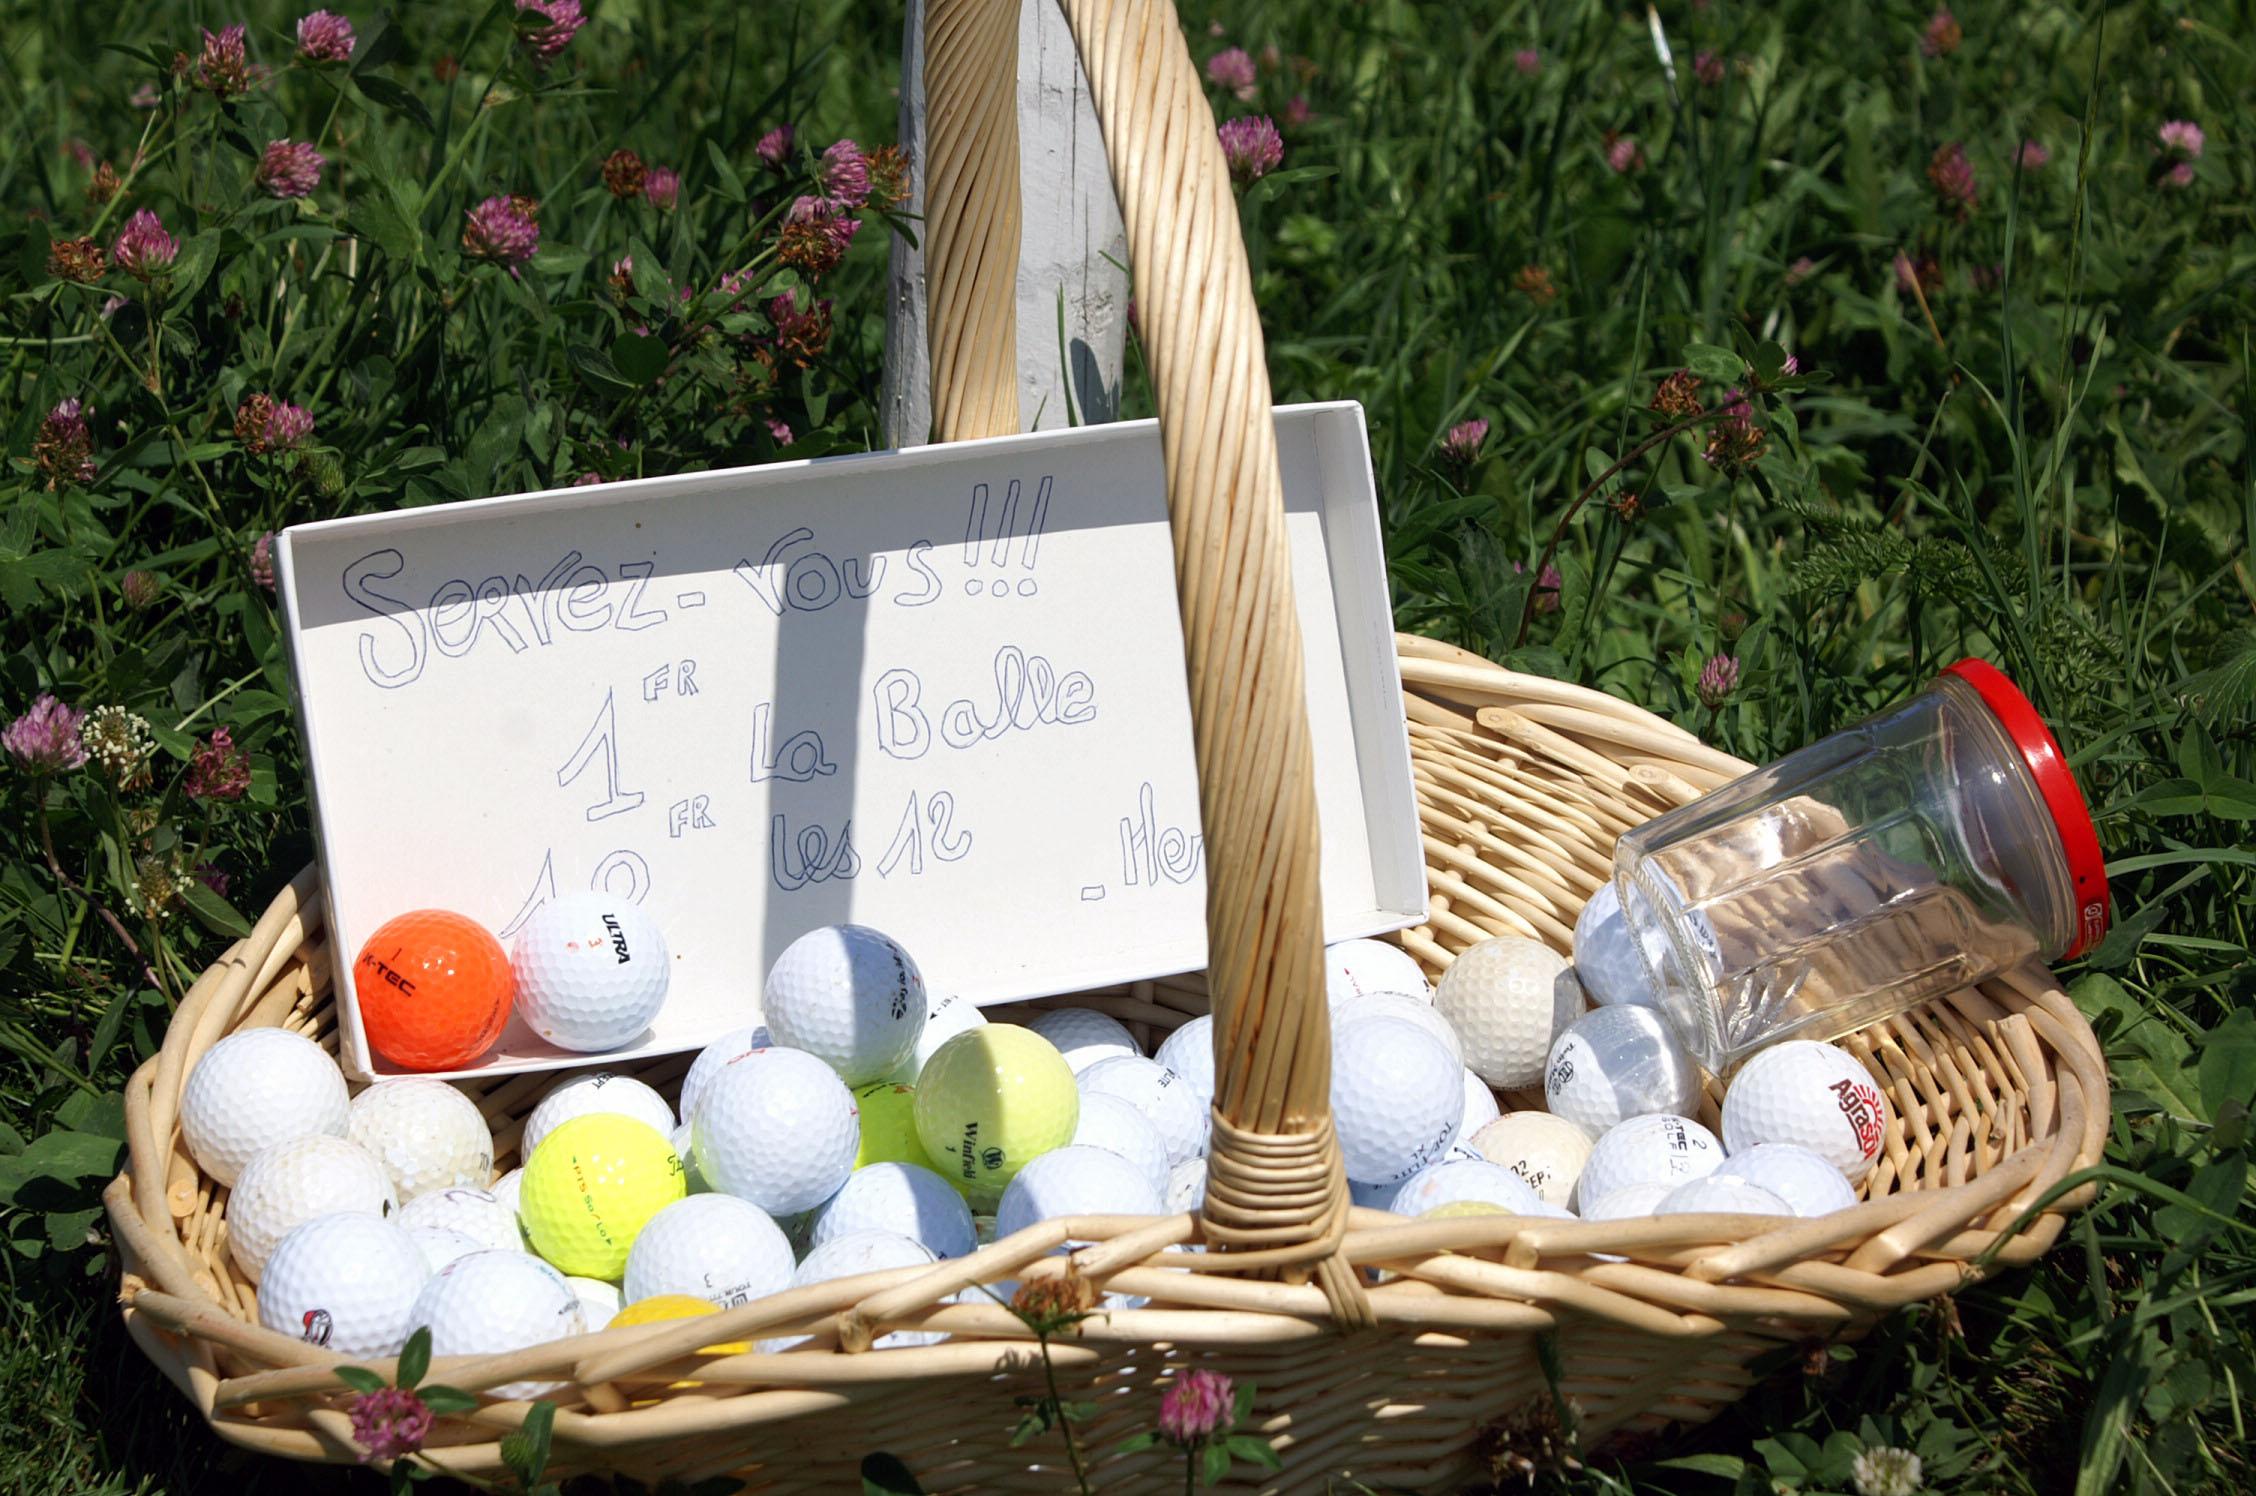 Korb mit Golfbällen und Kässeli